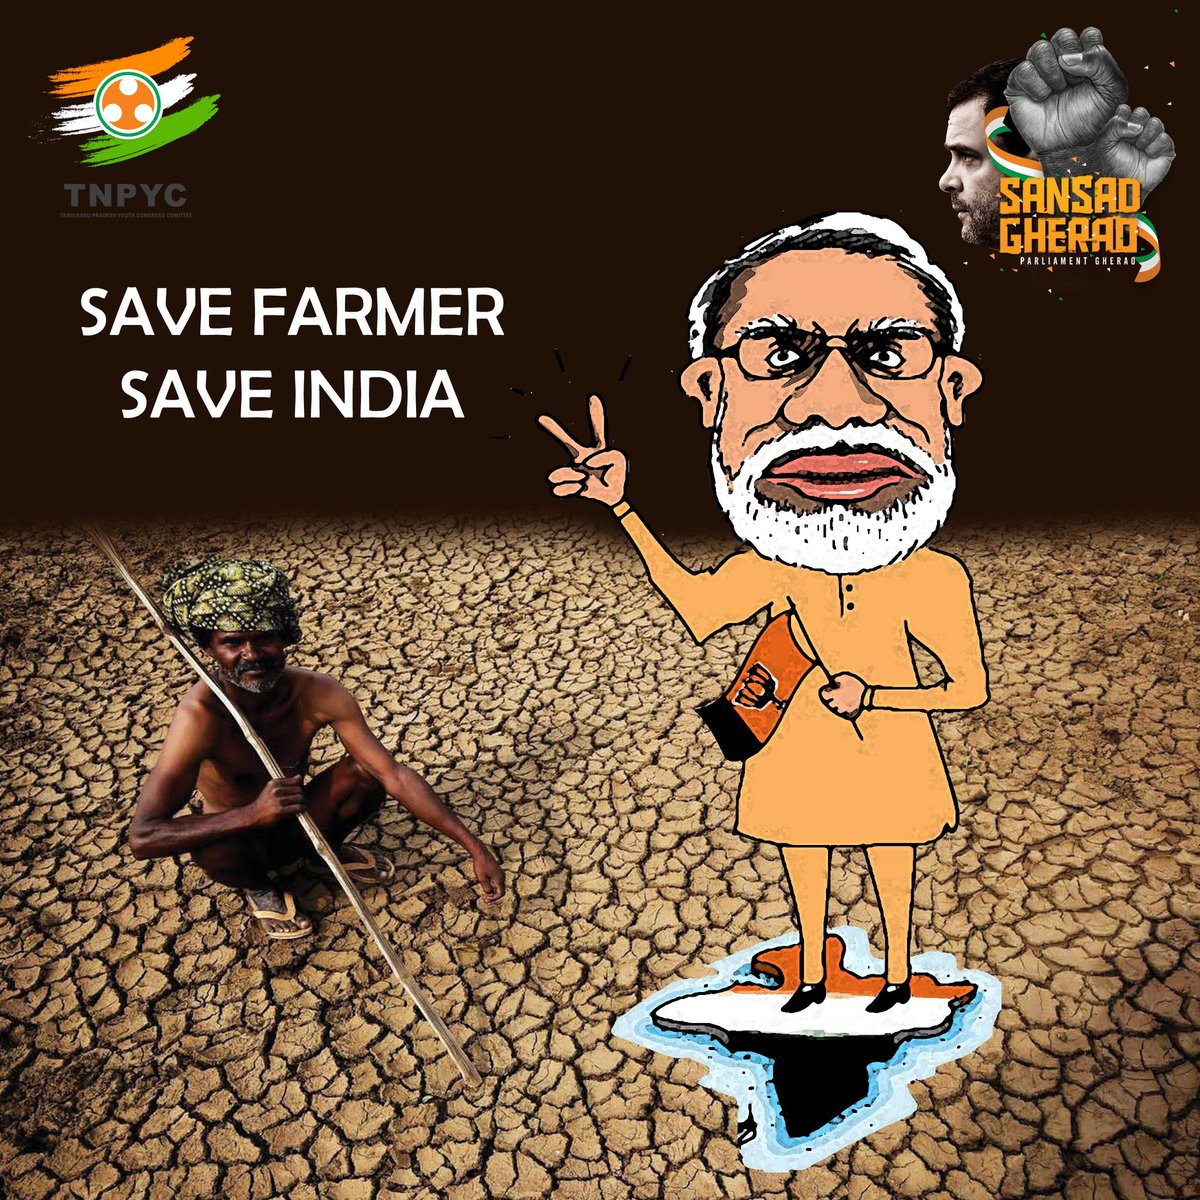 Save farmer 😢 Save India #SansadGherao